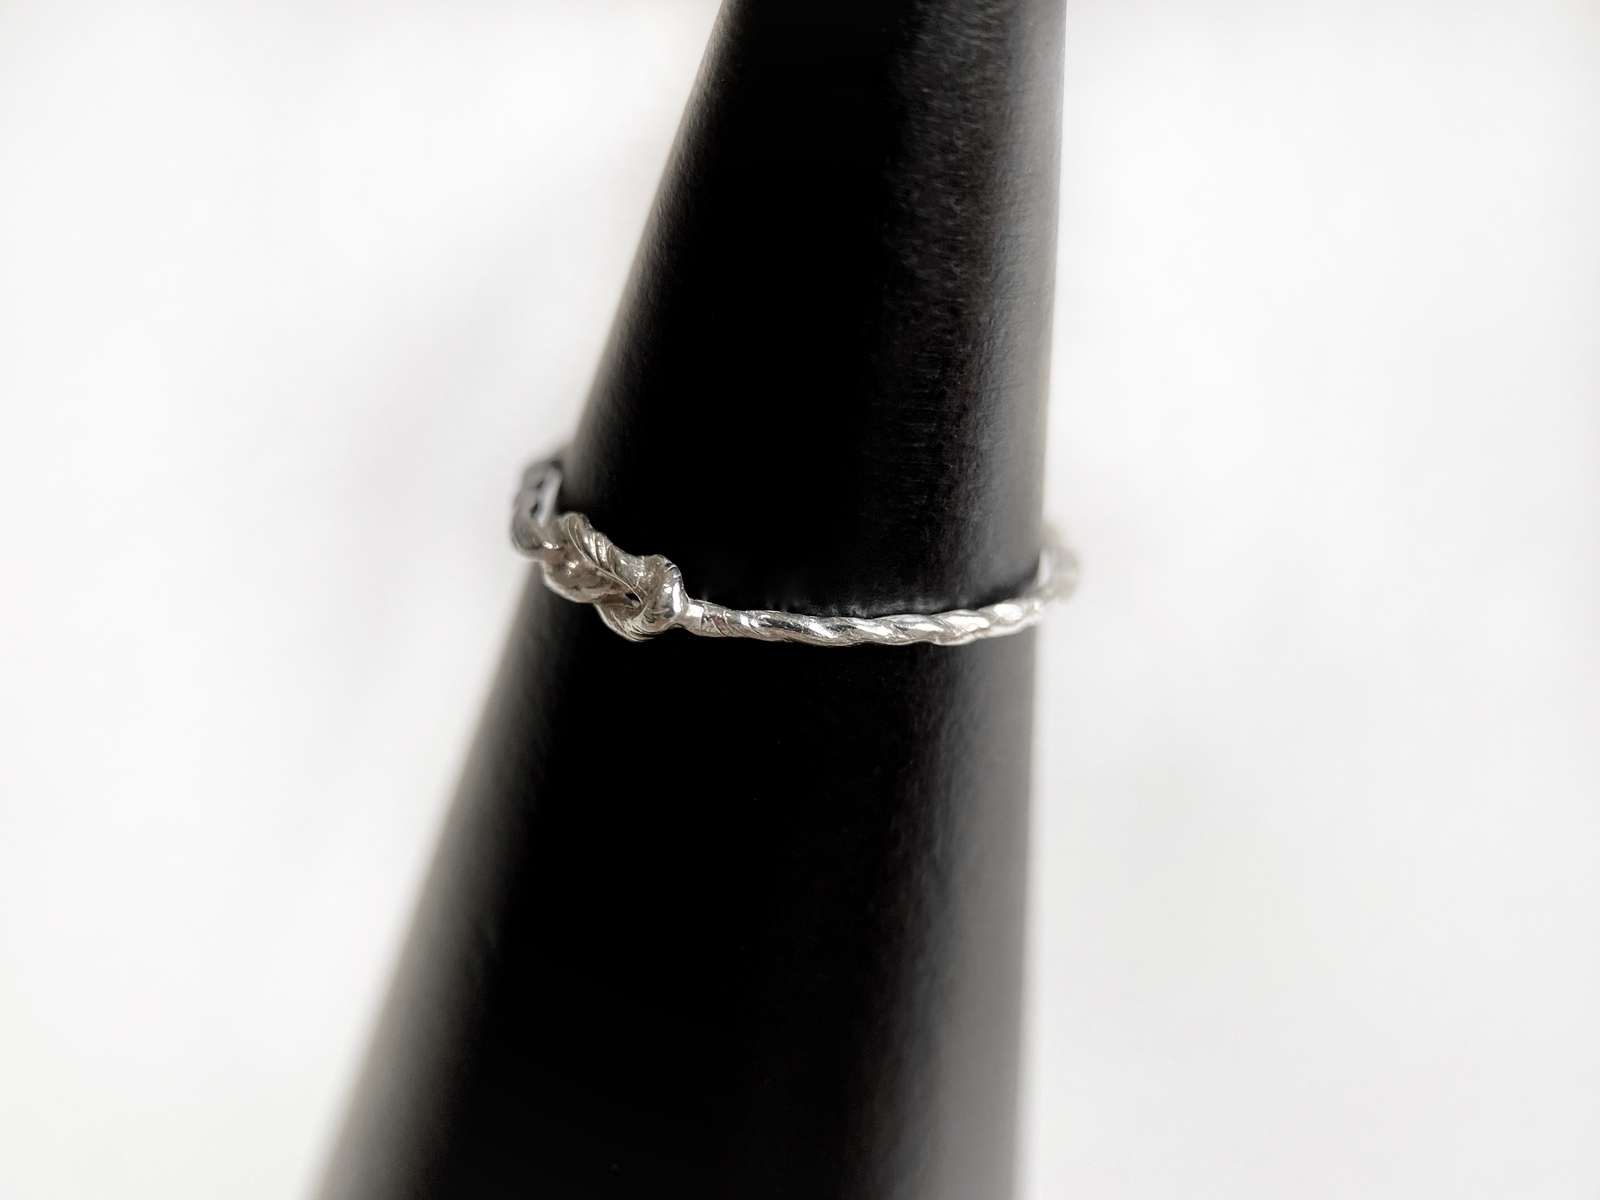 Koni&Koga LUCK Ring